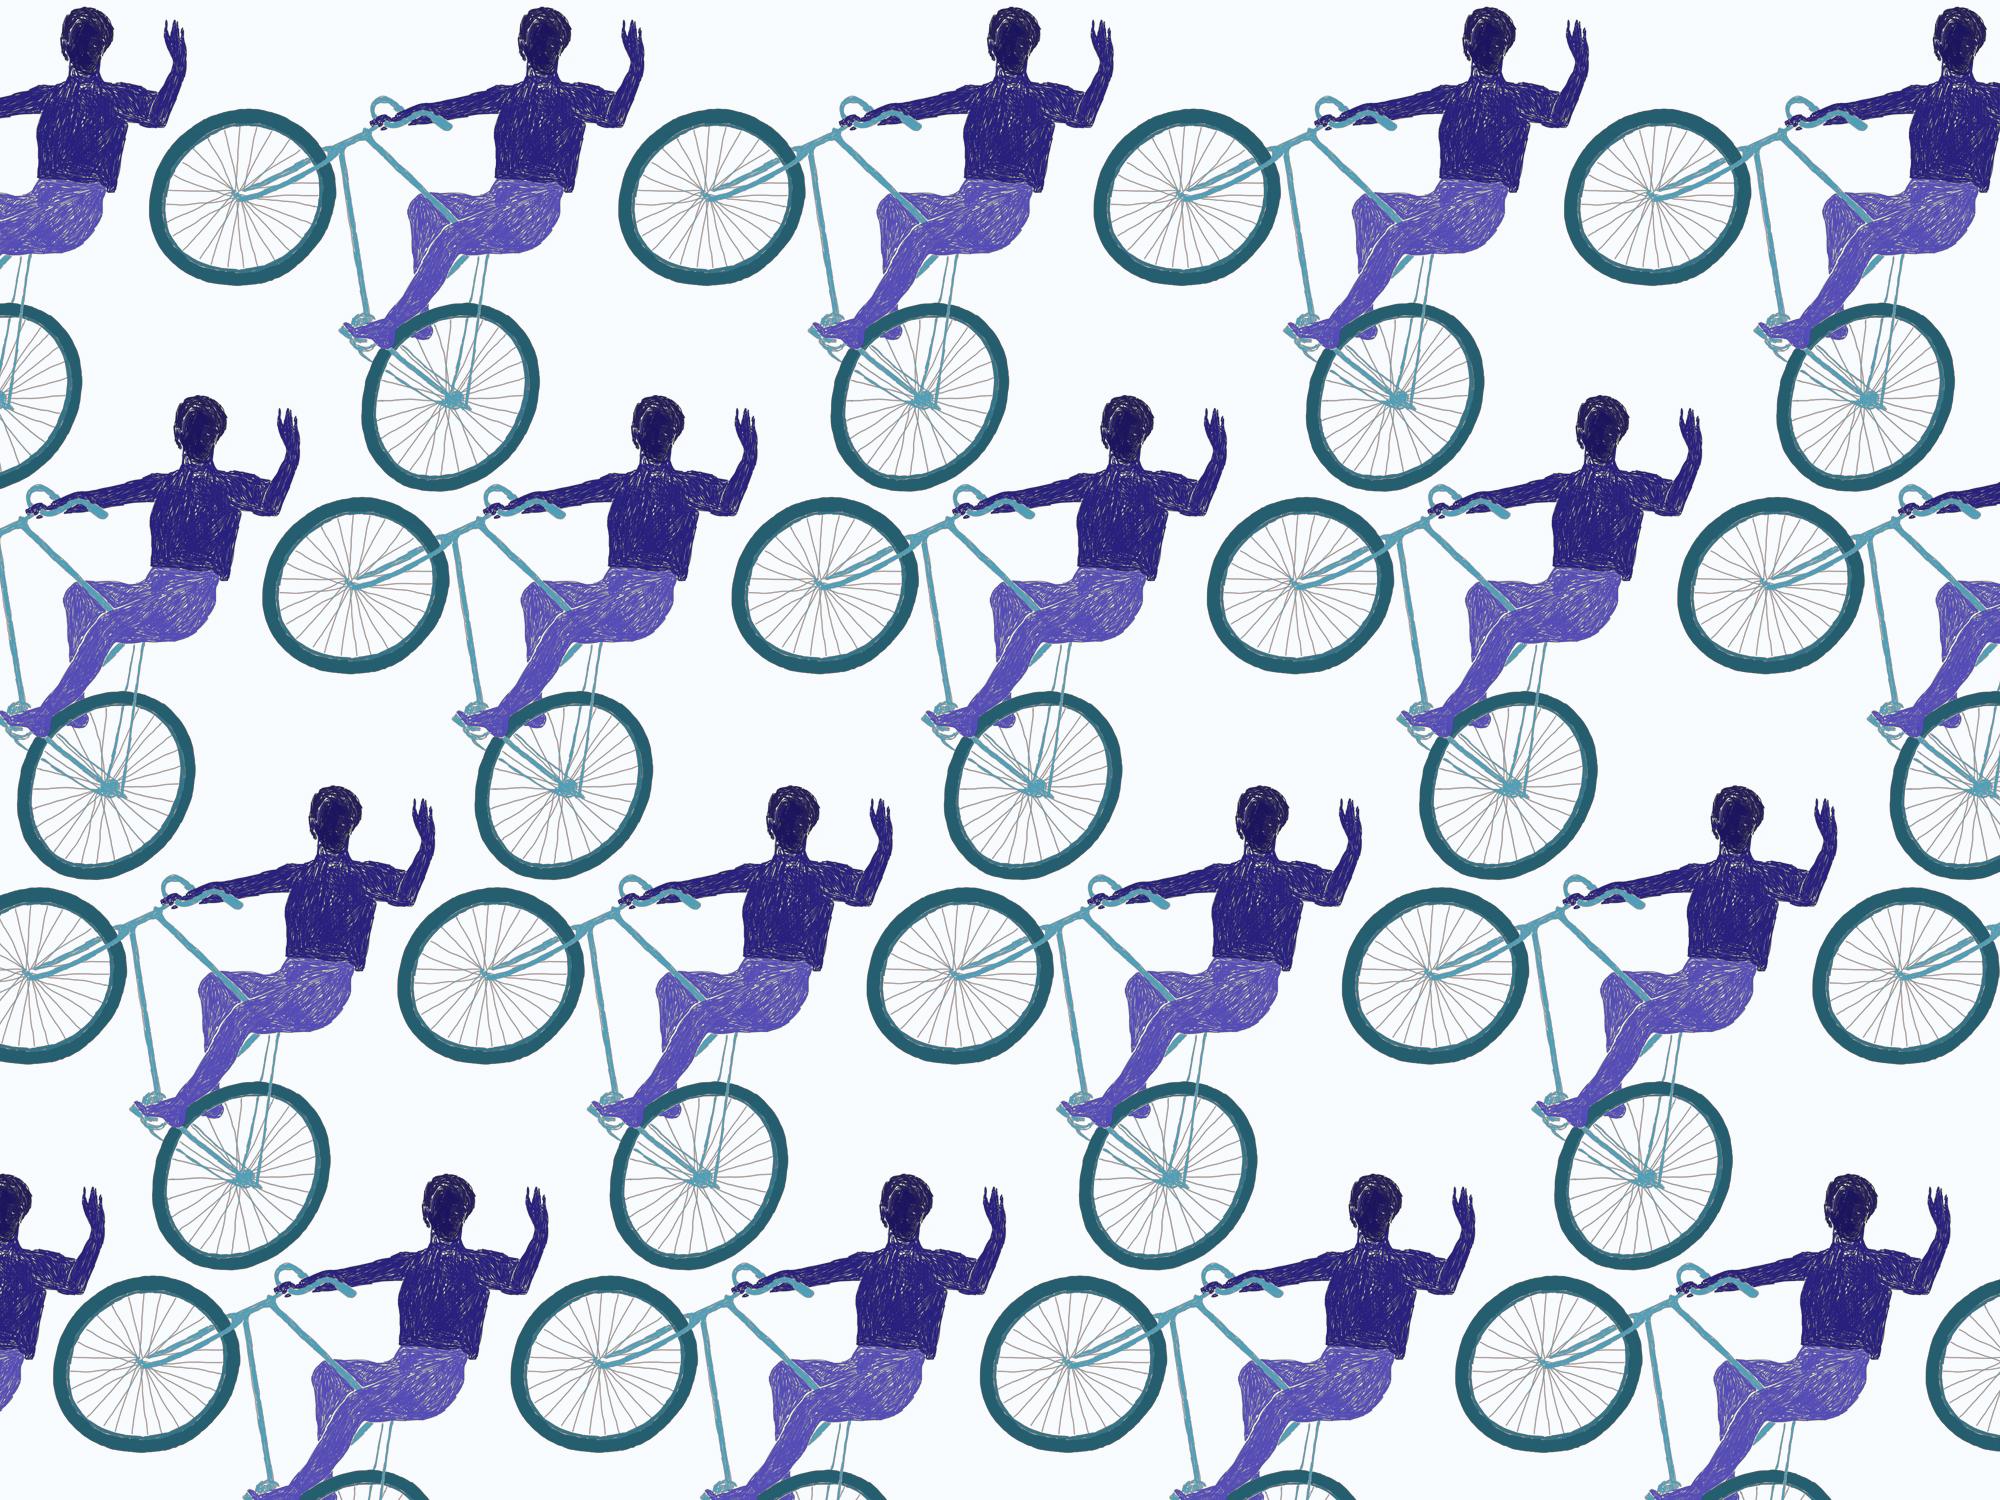 The cyclist_illustration01.jpg